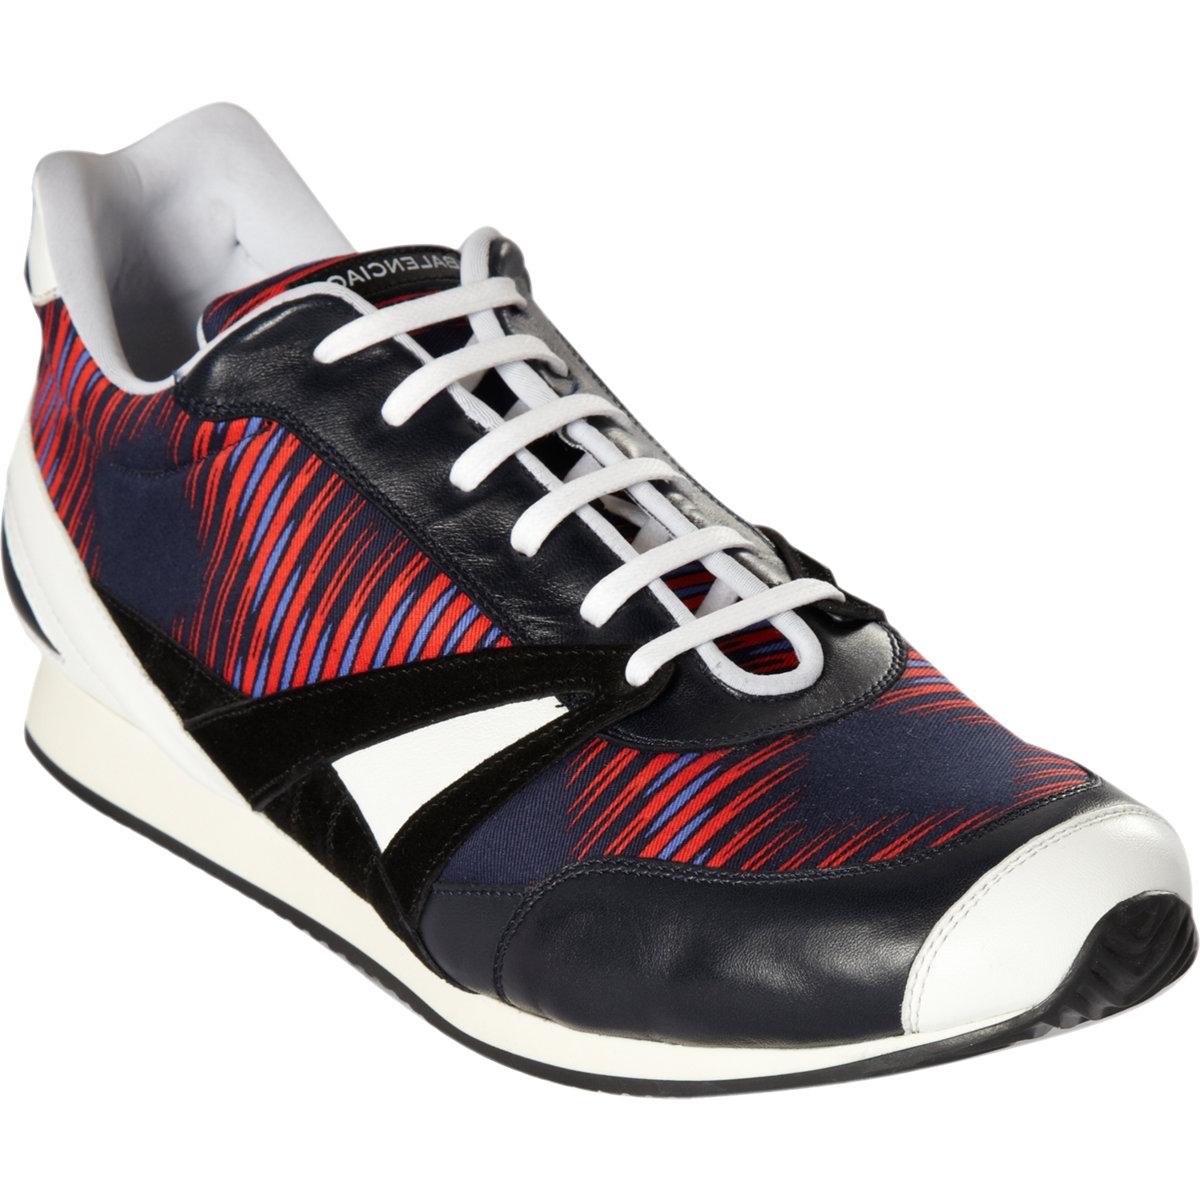 balenciaga low top sneakers in multicolor for men blue lyst. Black Bedroom Furniture Sets. Home Design Ideas